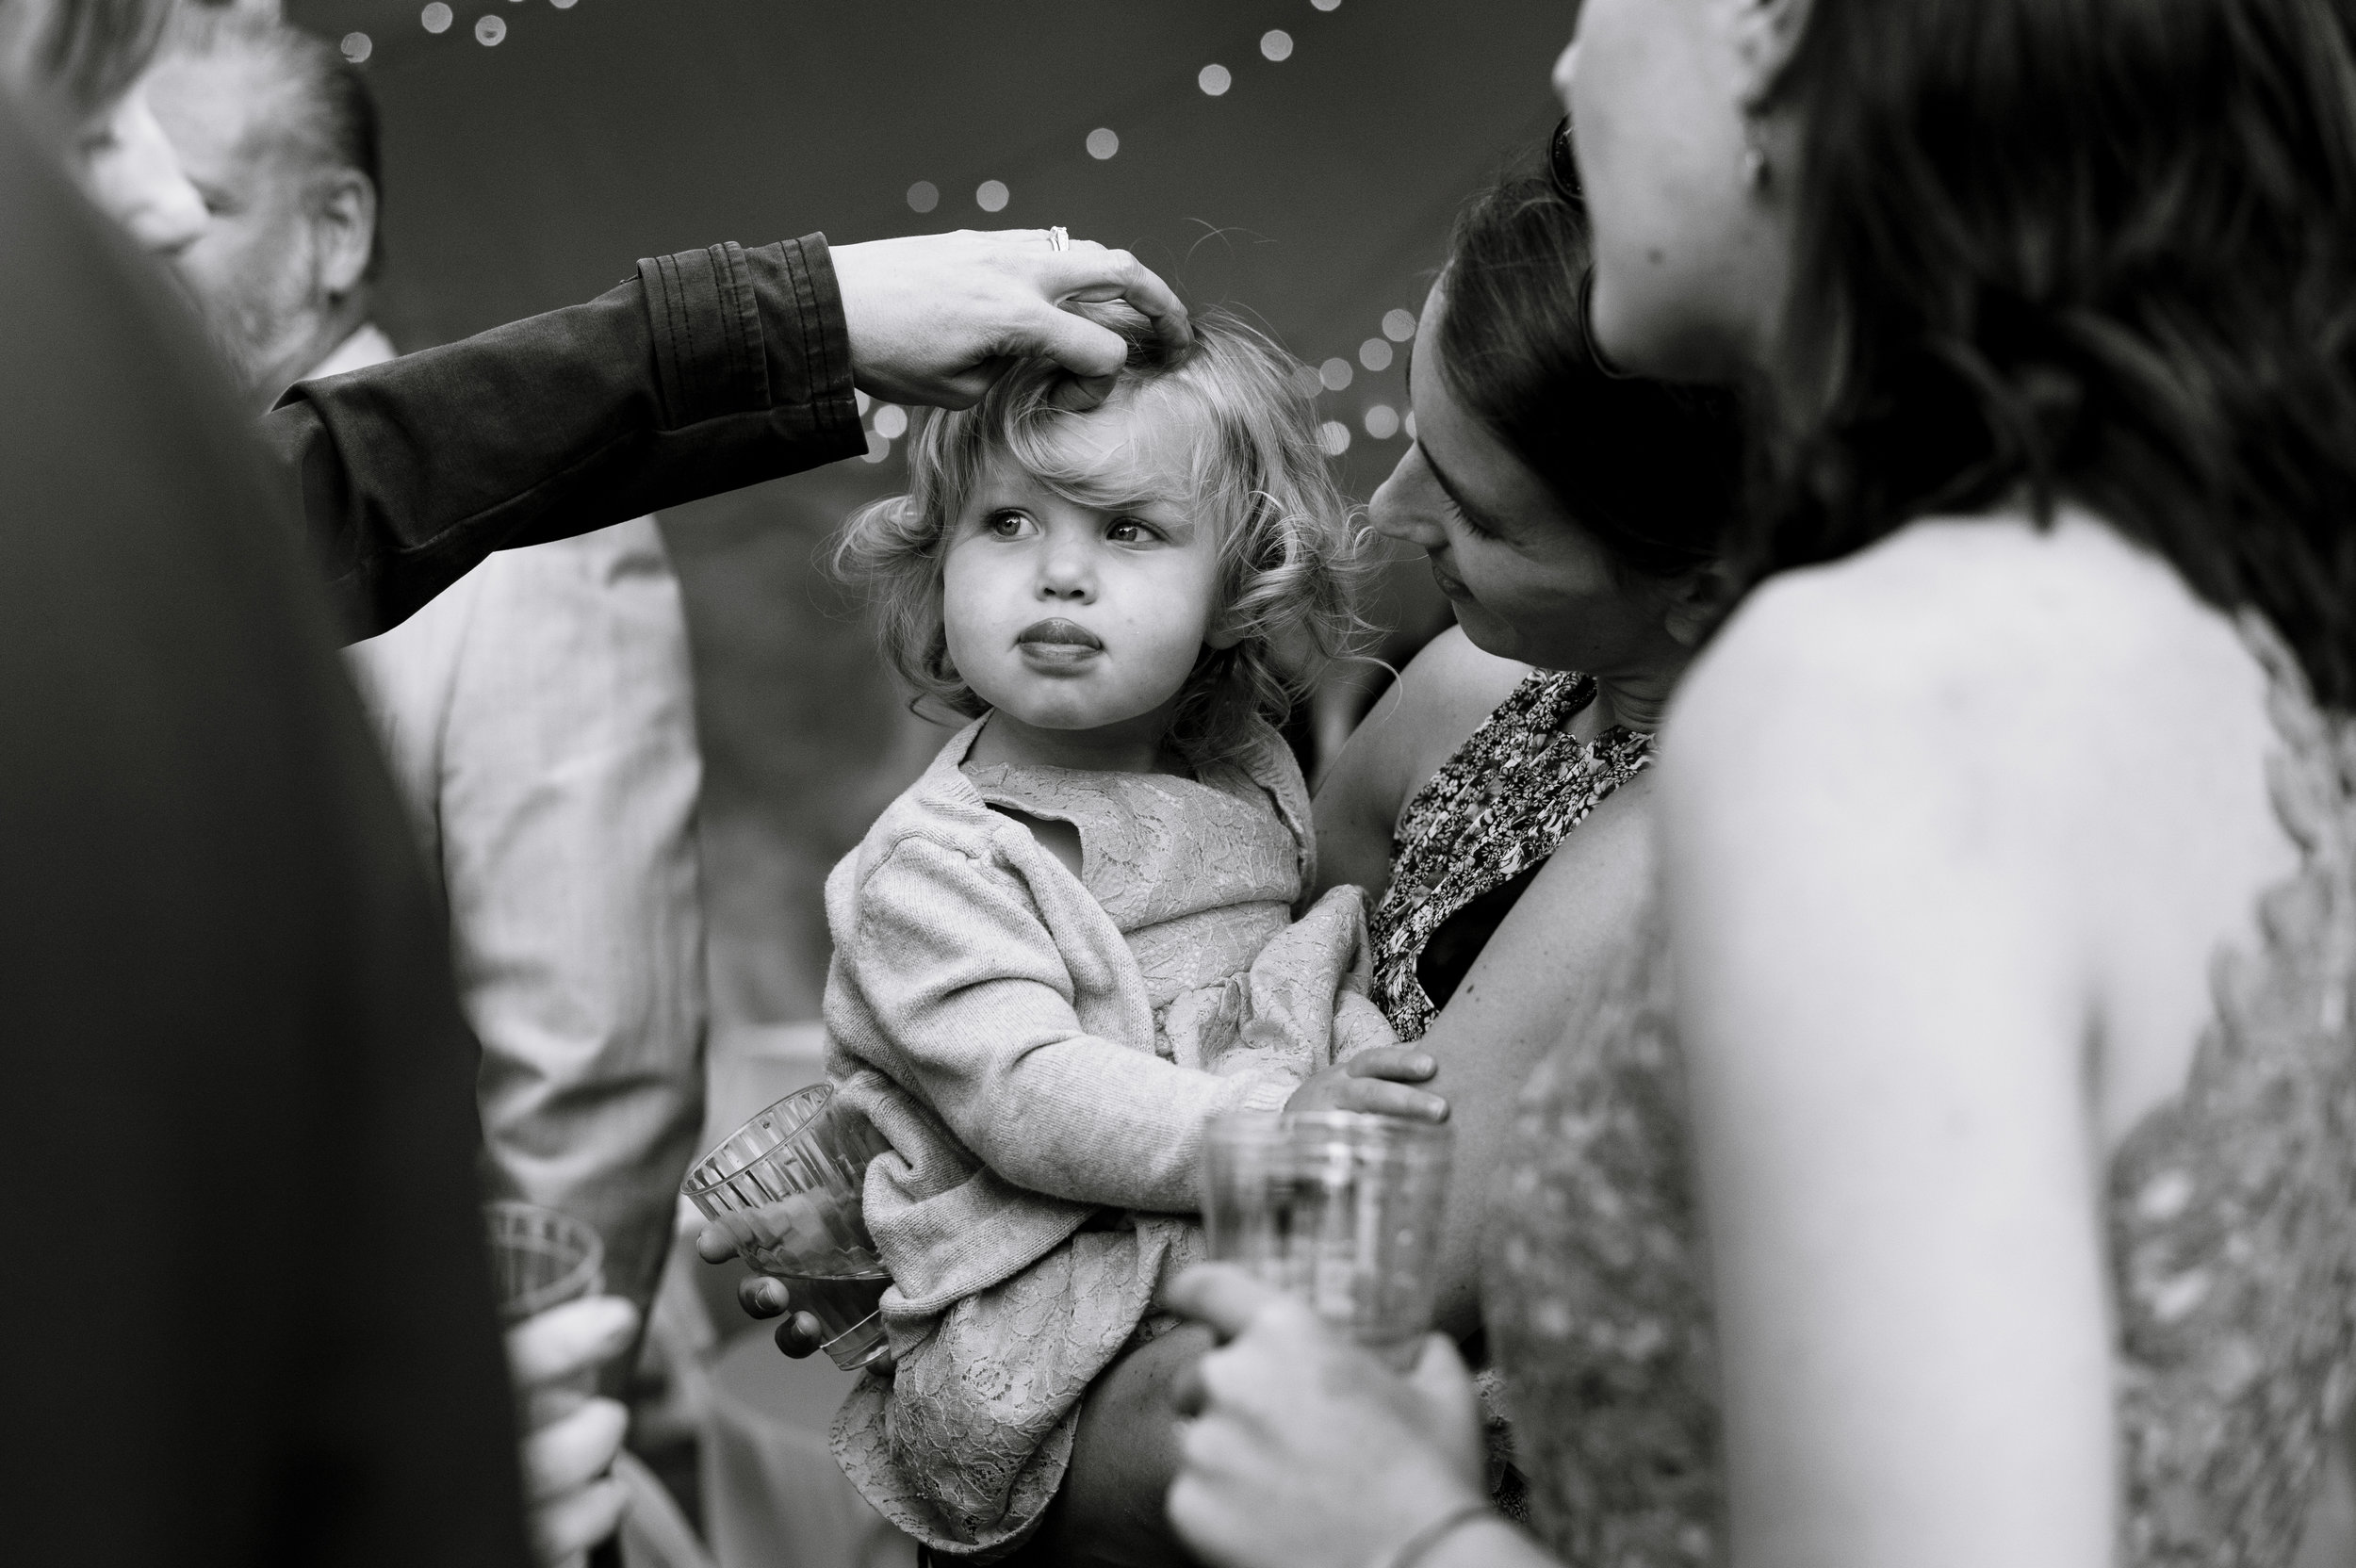 Candid-Wedding-Photography-Boston021.jpg